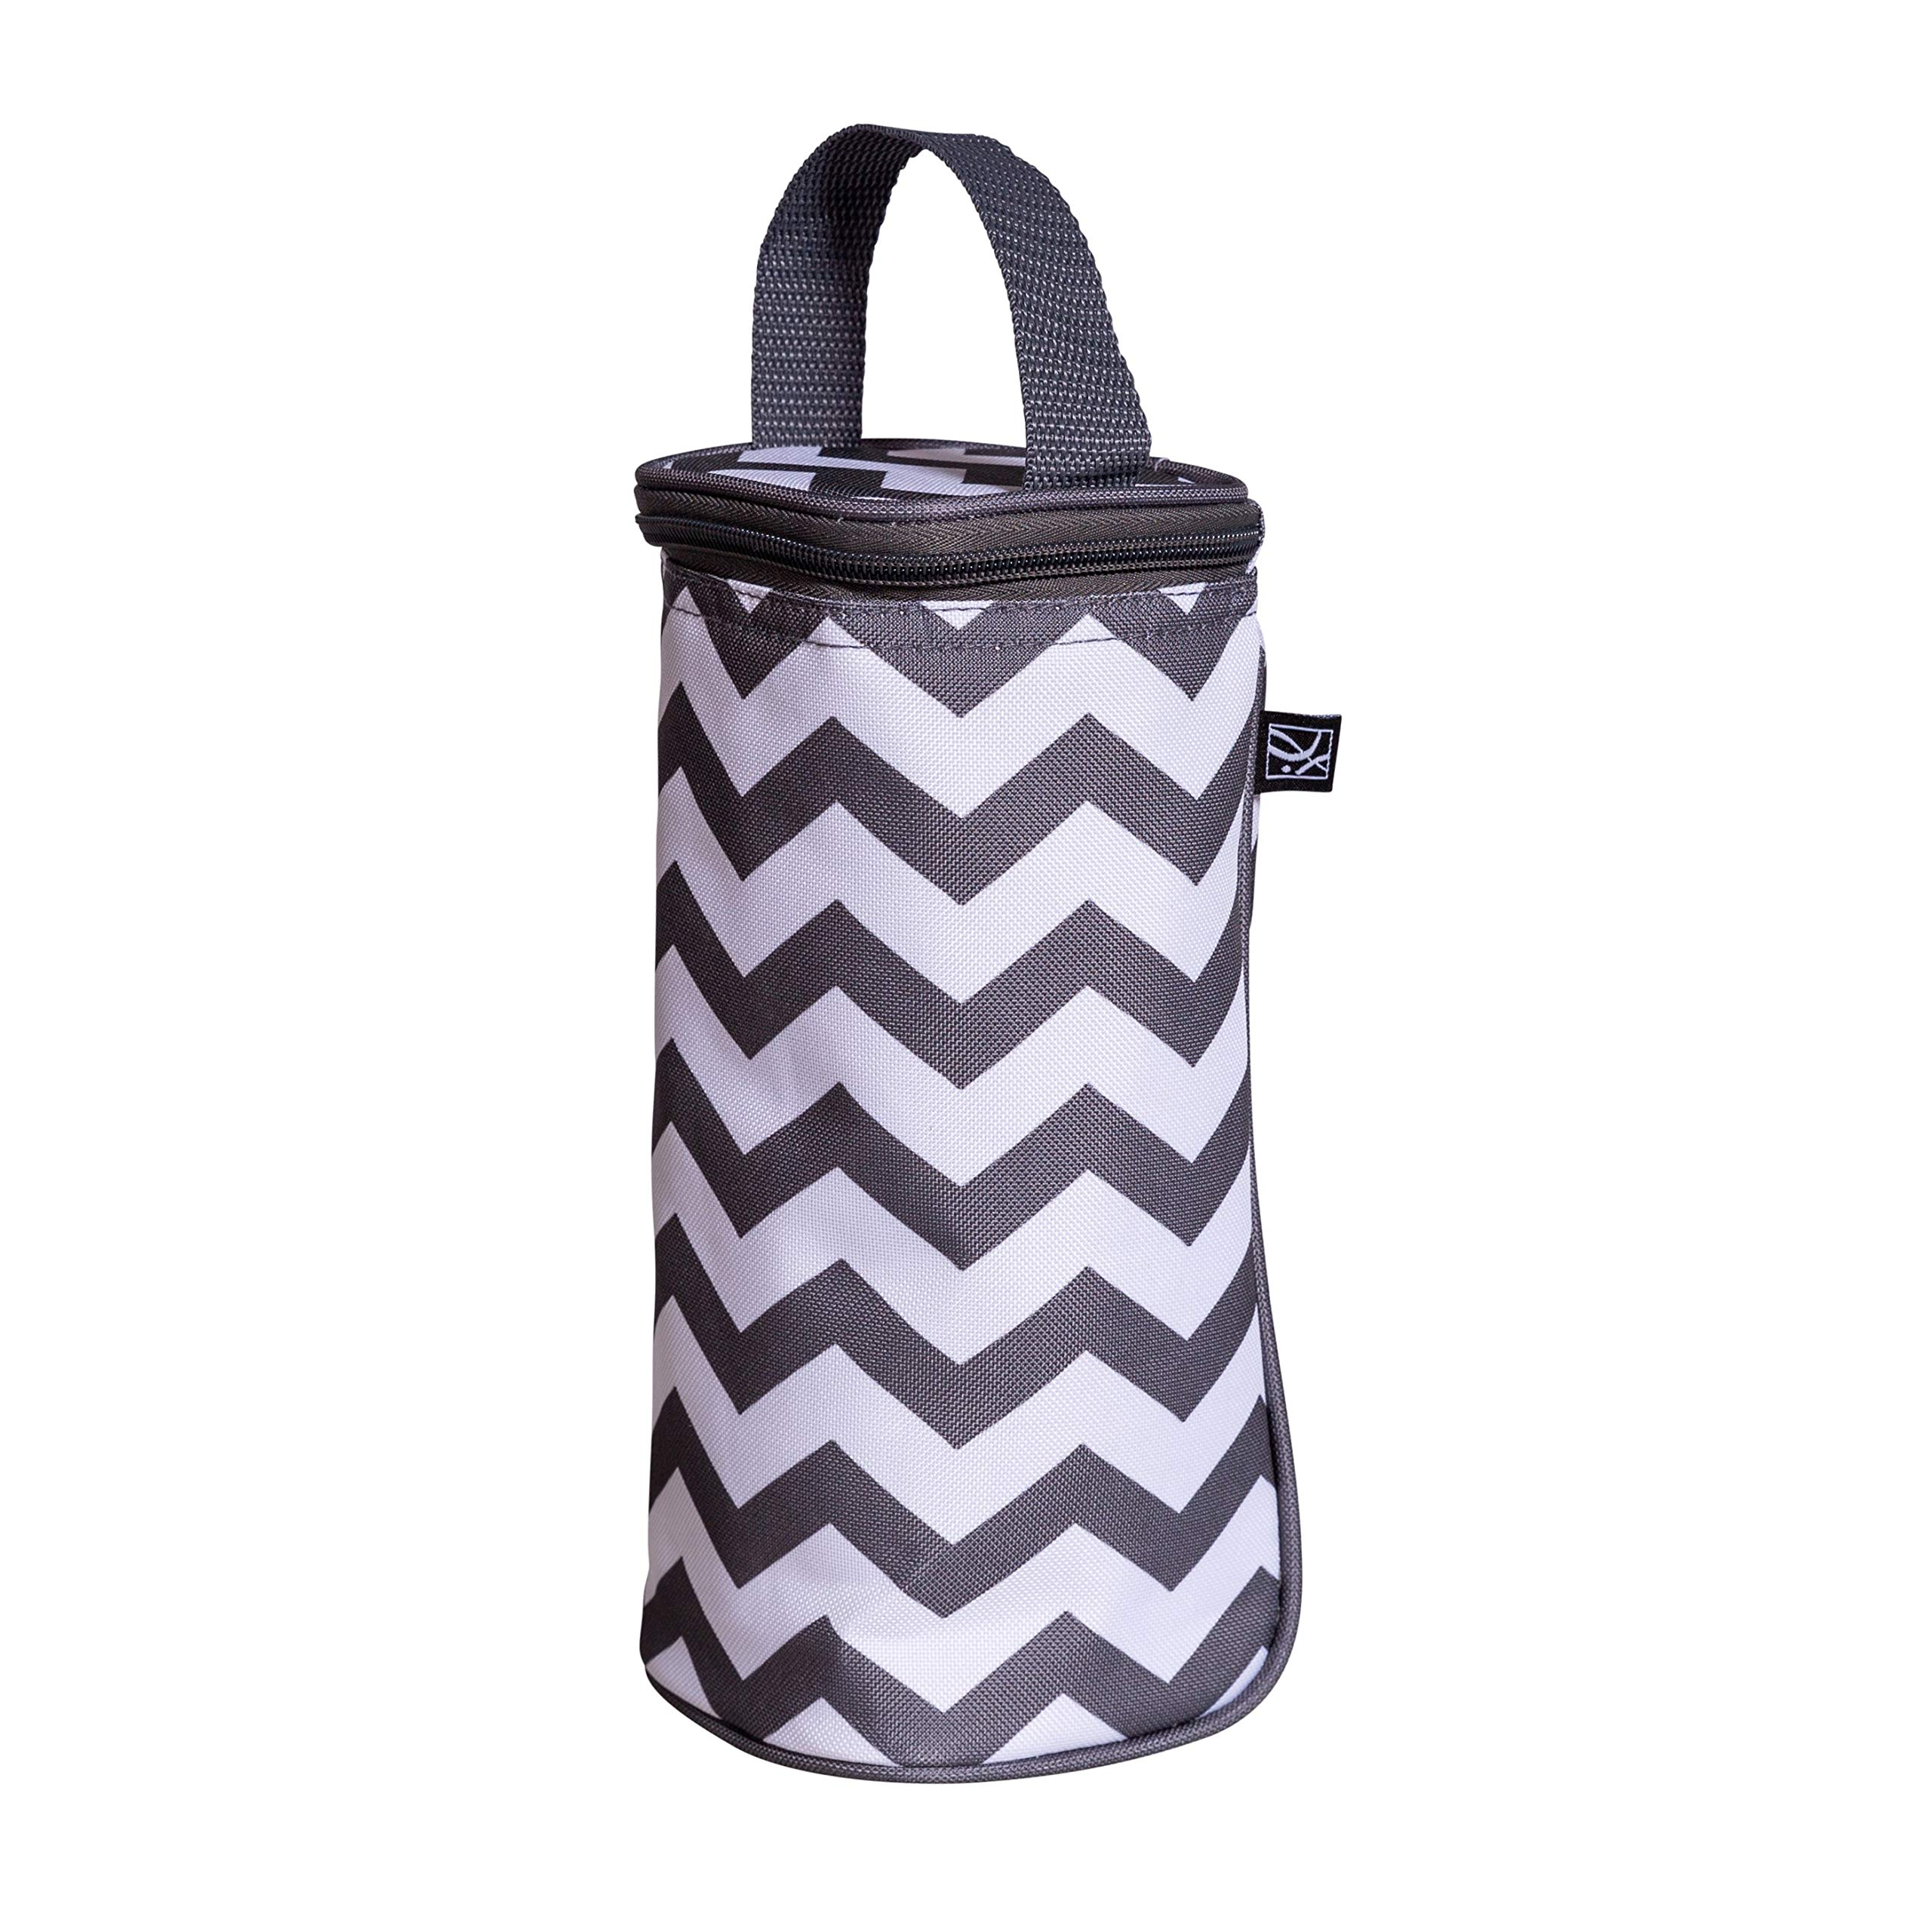 J.L. Childress Breastmilk Cooler & Baby Bottle Bag, Insulated & Leak Proof, Ice Pack Included, Single Bottle, Grey Chevron